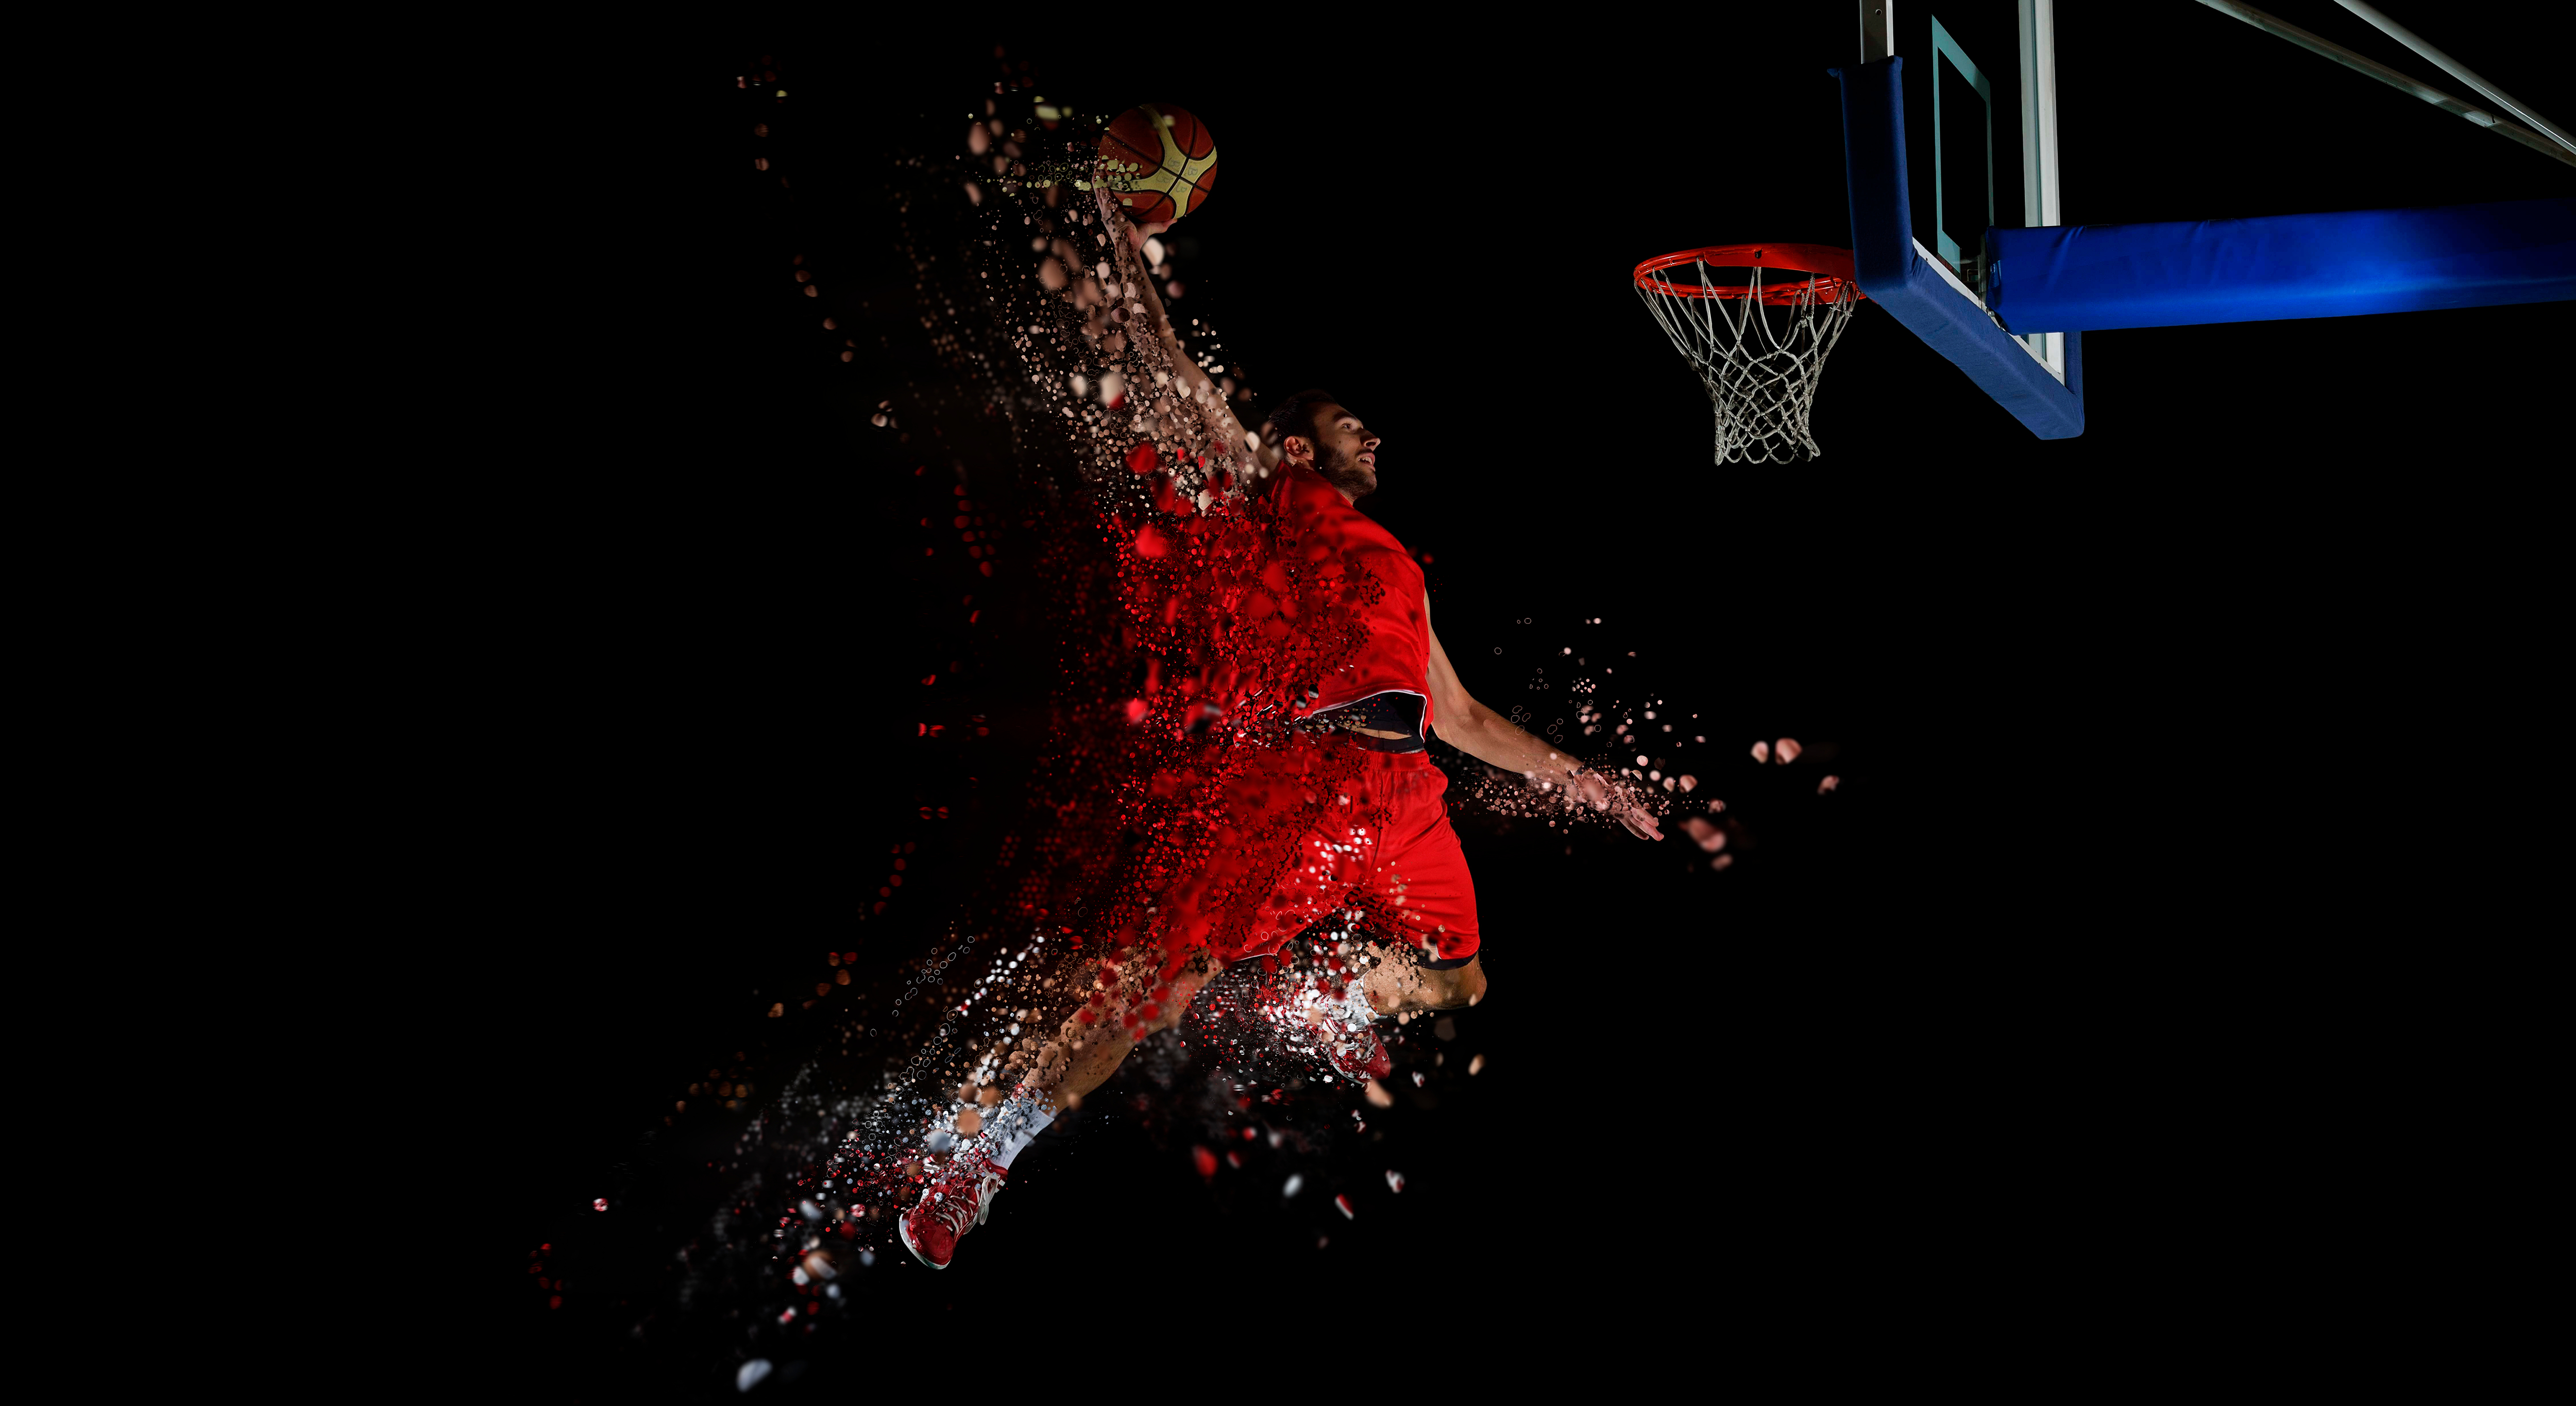 Basketball 4k Ultra Hd Wallpaper Background Image 5000x2729 Id 872479 Wallpaper Abyss